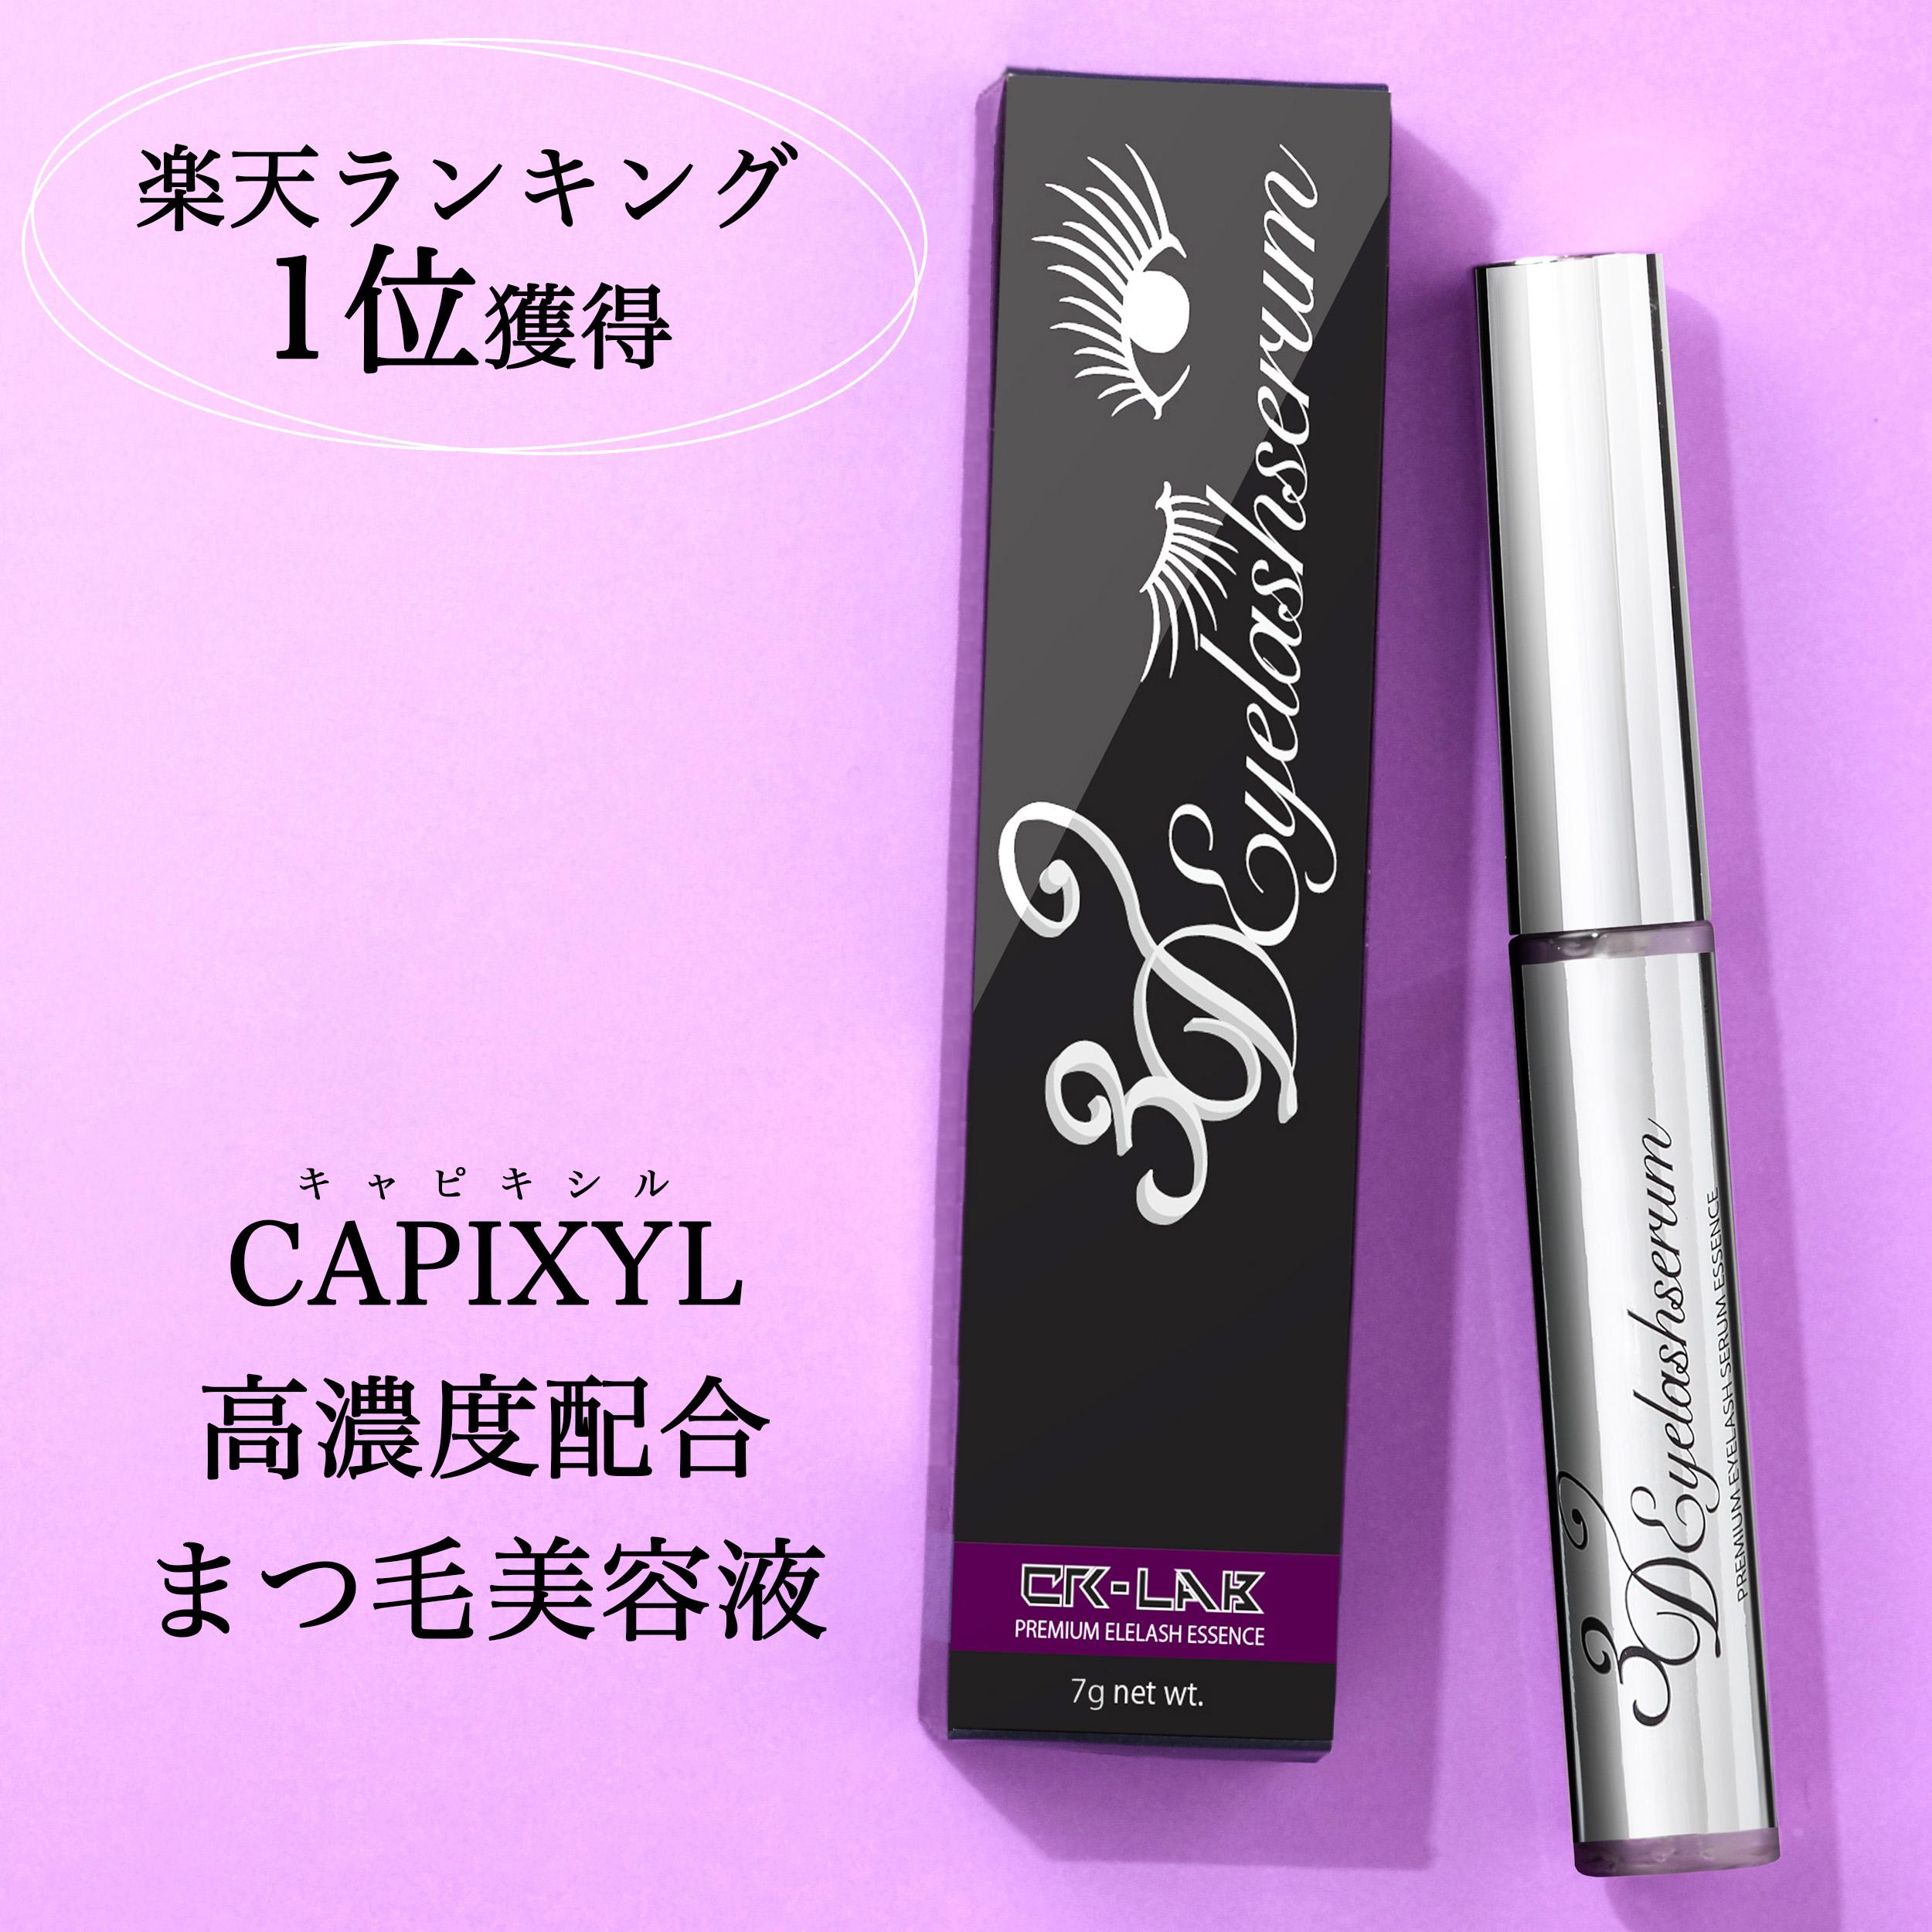 CAPIXYL キャピキシル 高配合の話題のまつ毛美容液 3Dアイラッシュセラム 秀逸 キャピキシル高配合 約2-3ヶ月分 日本限定 7g まつ毛美容液 日本産